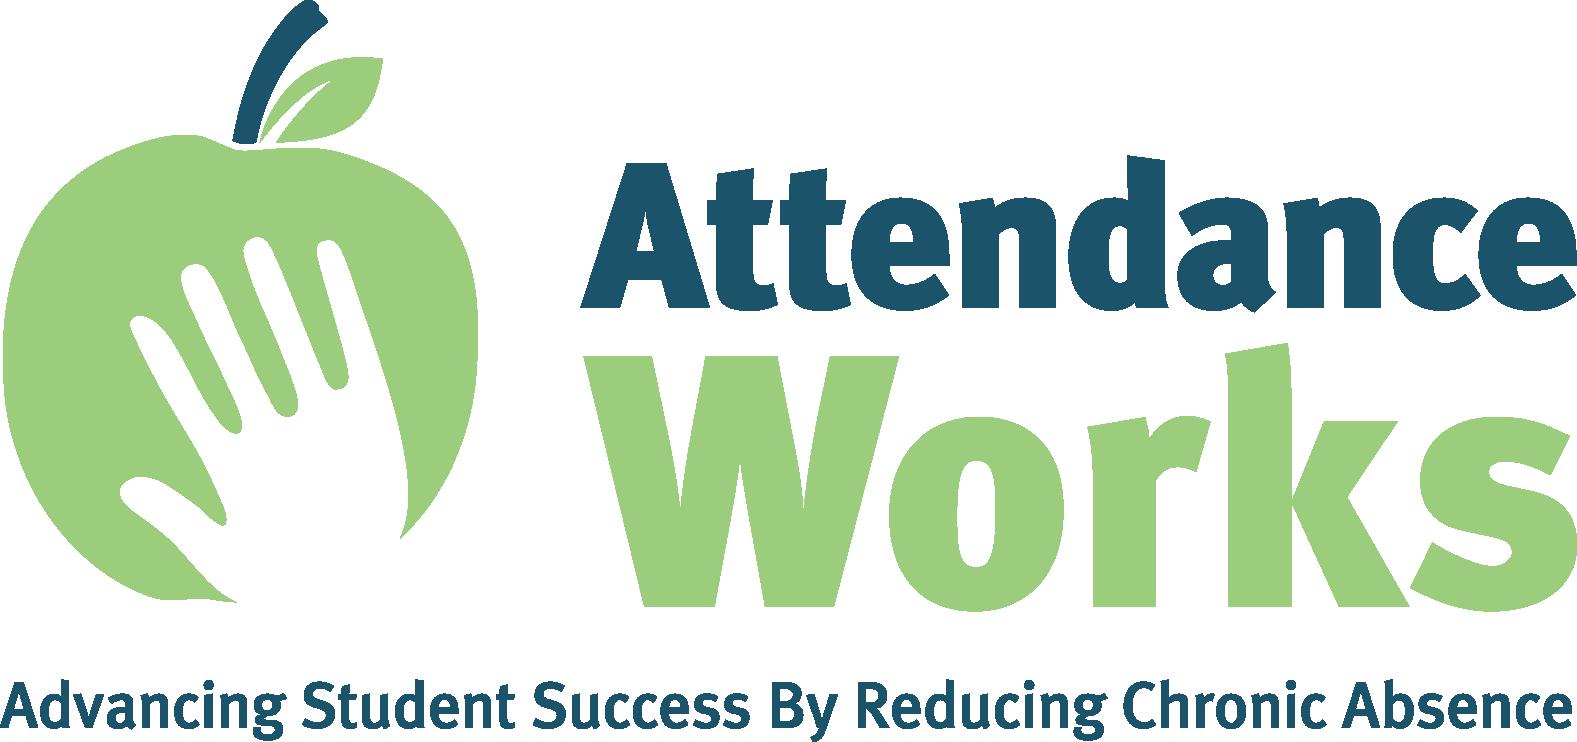 Student Attendance Success Plans - Attendance Works